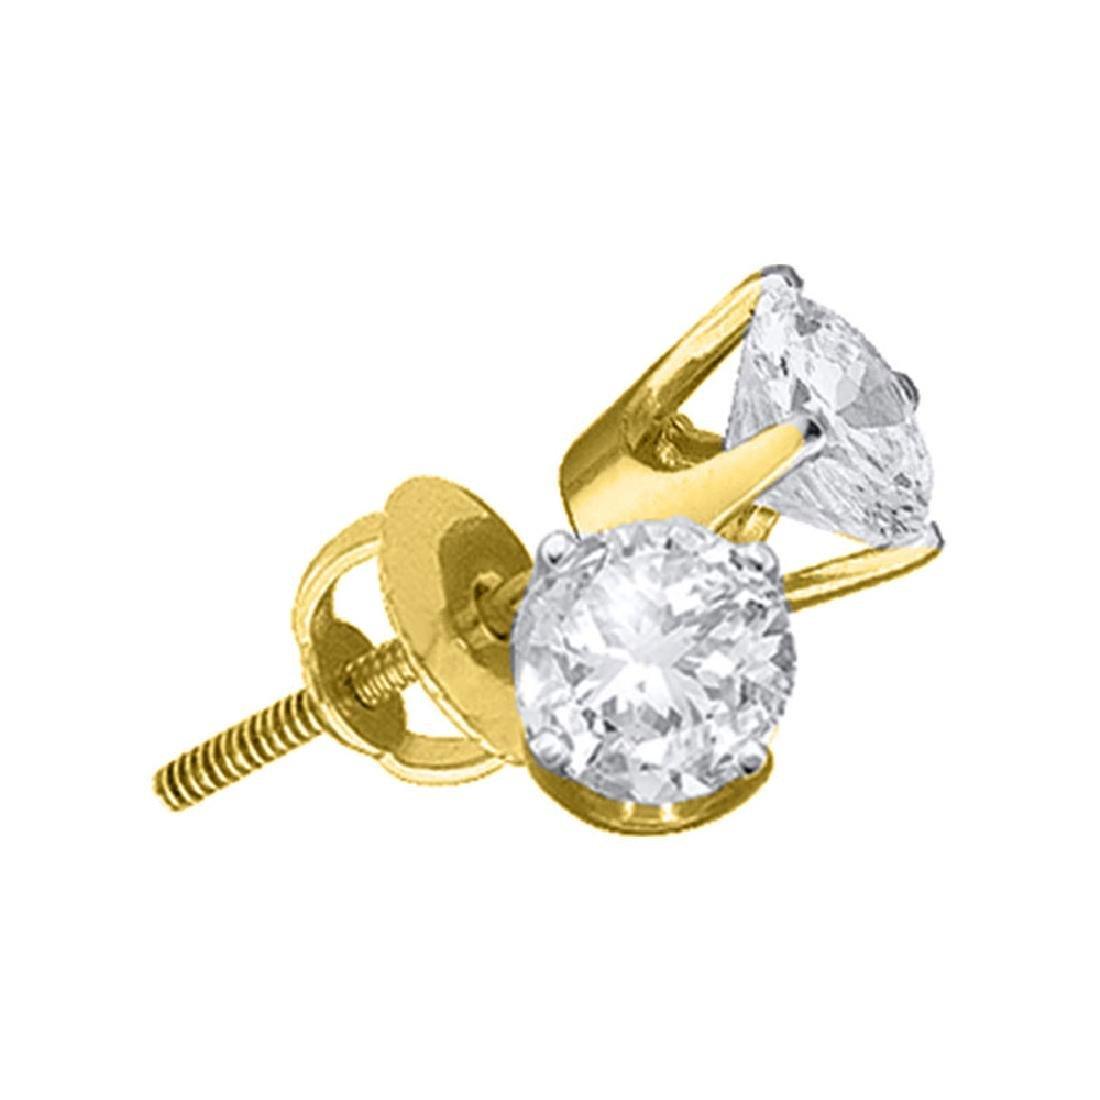 0.25 CTW Diamond Solitaire Stud Earrings 14KT Yellow